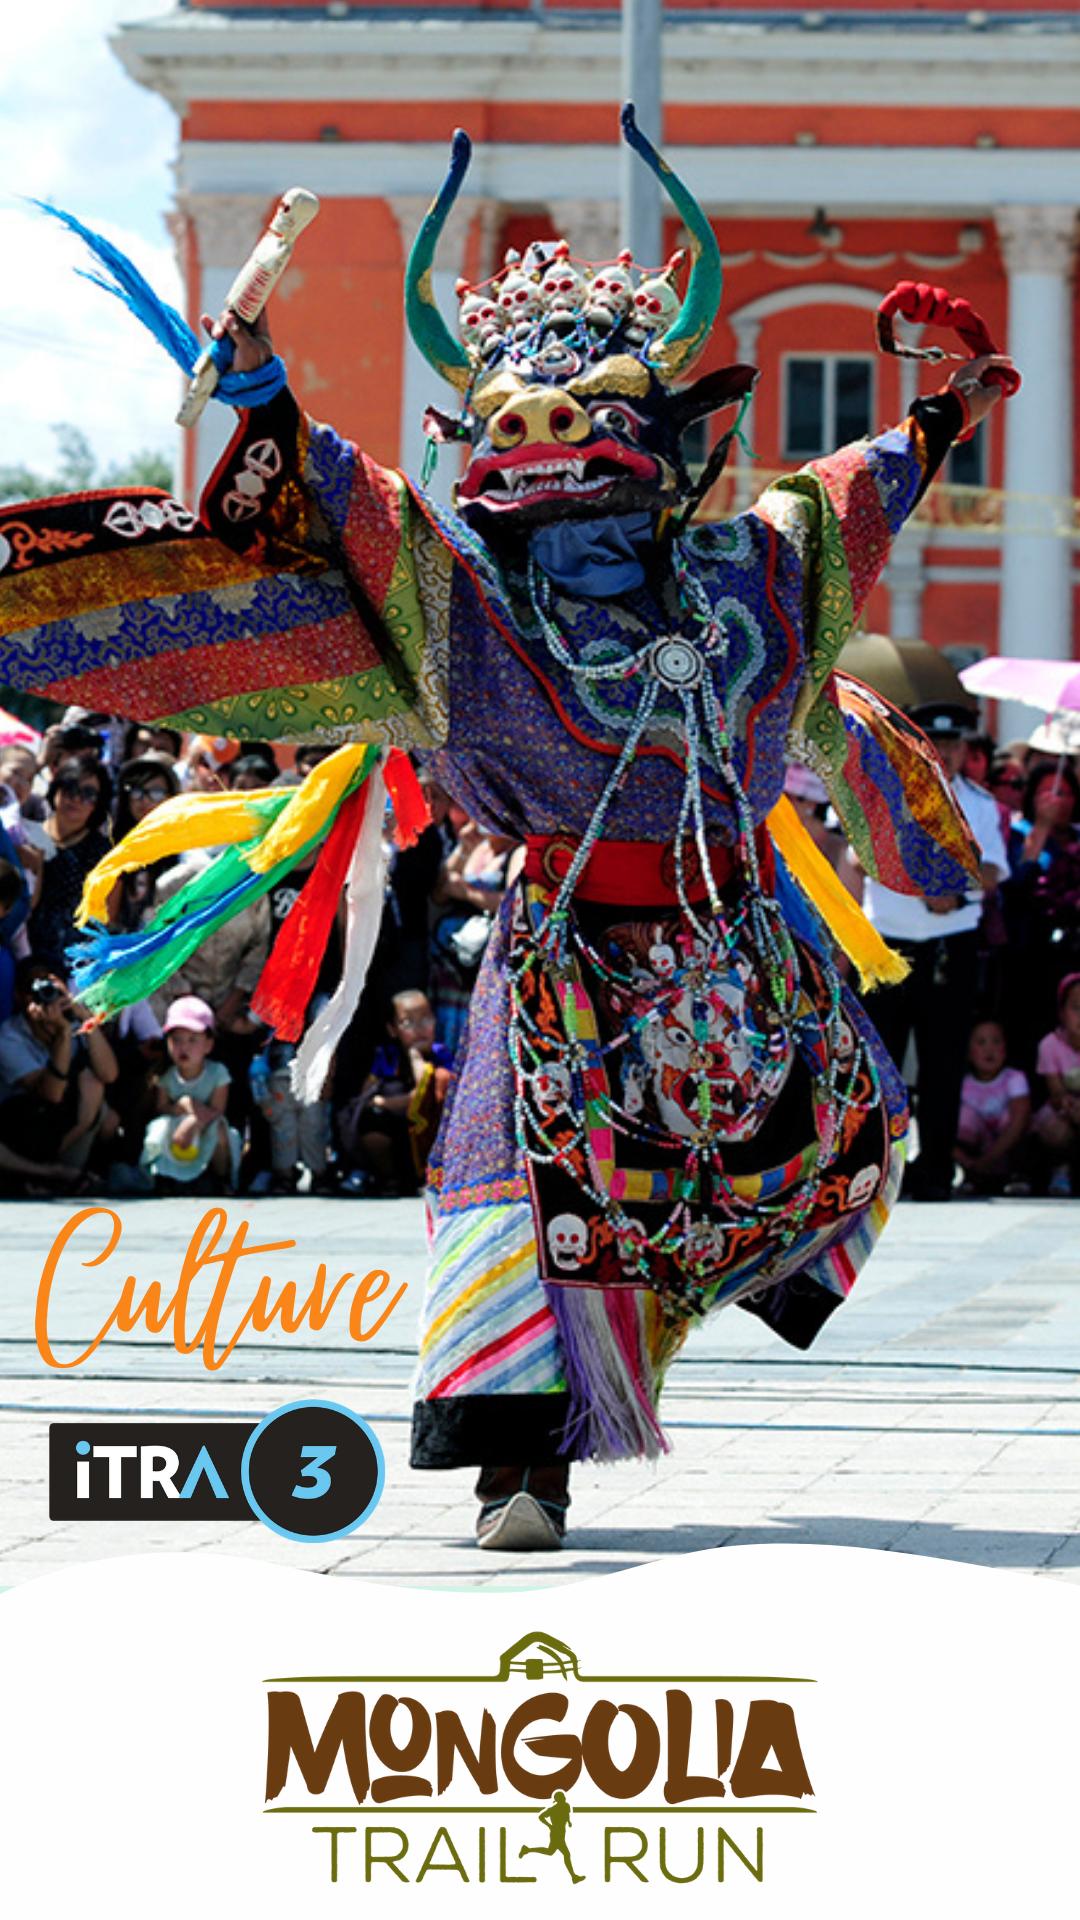 mongolia trail run cultura